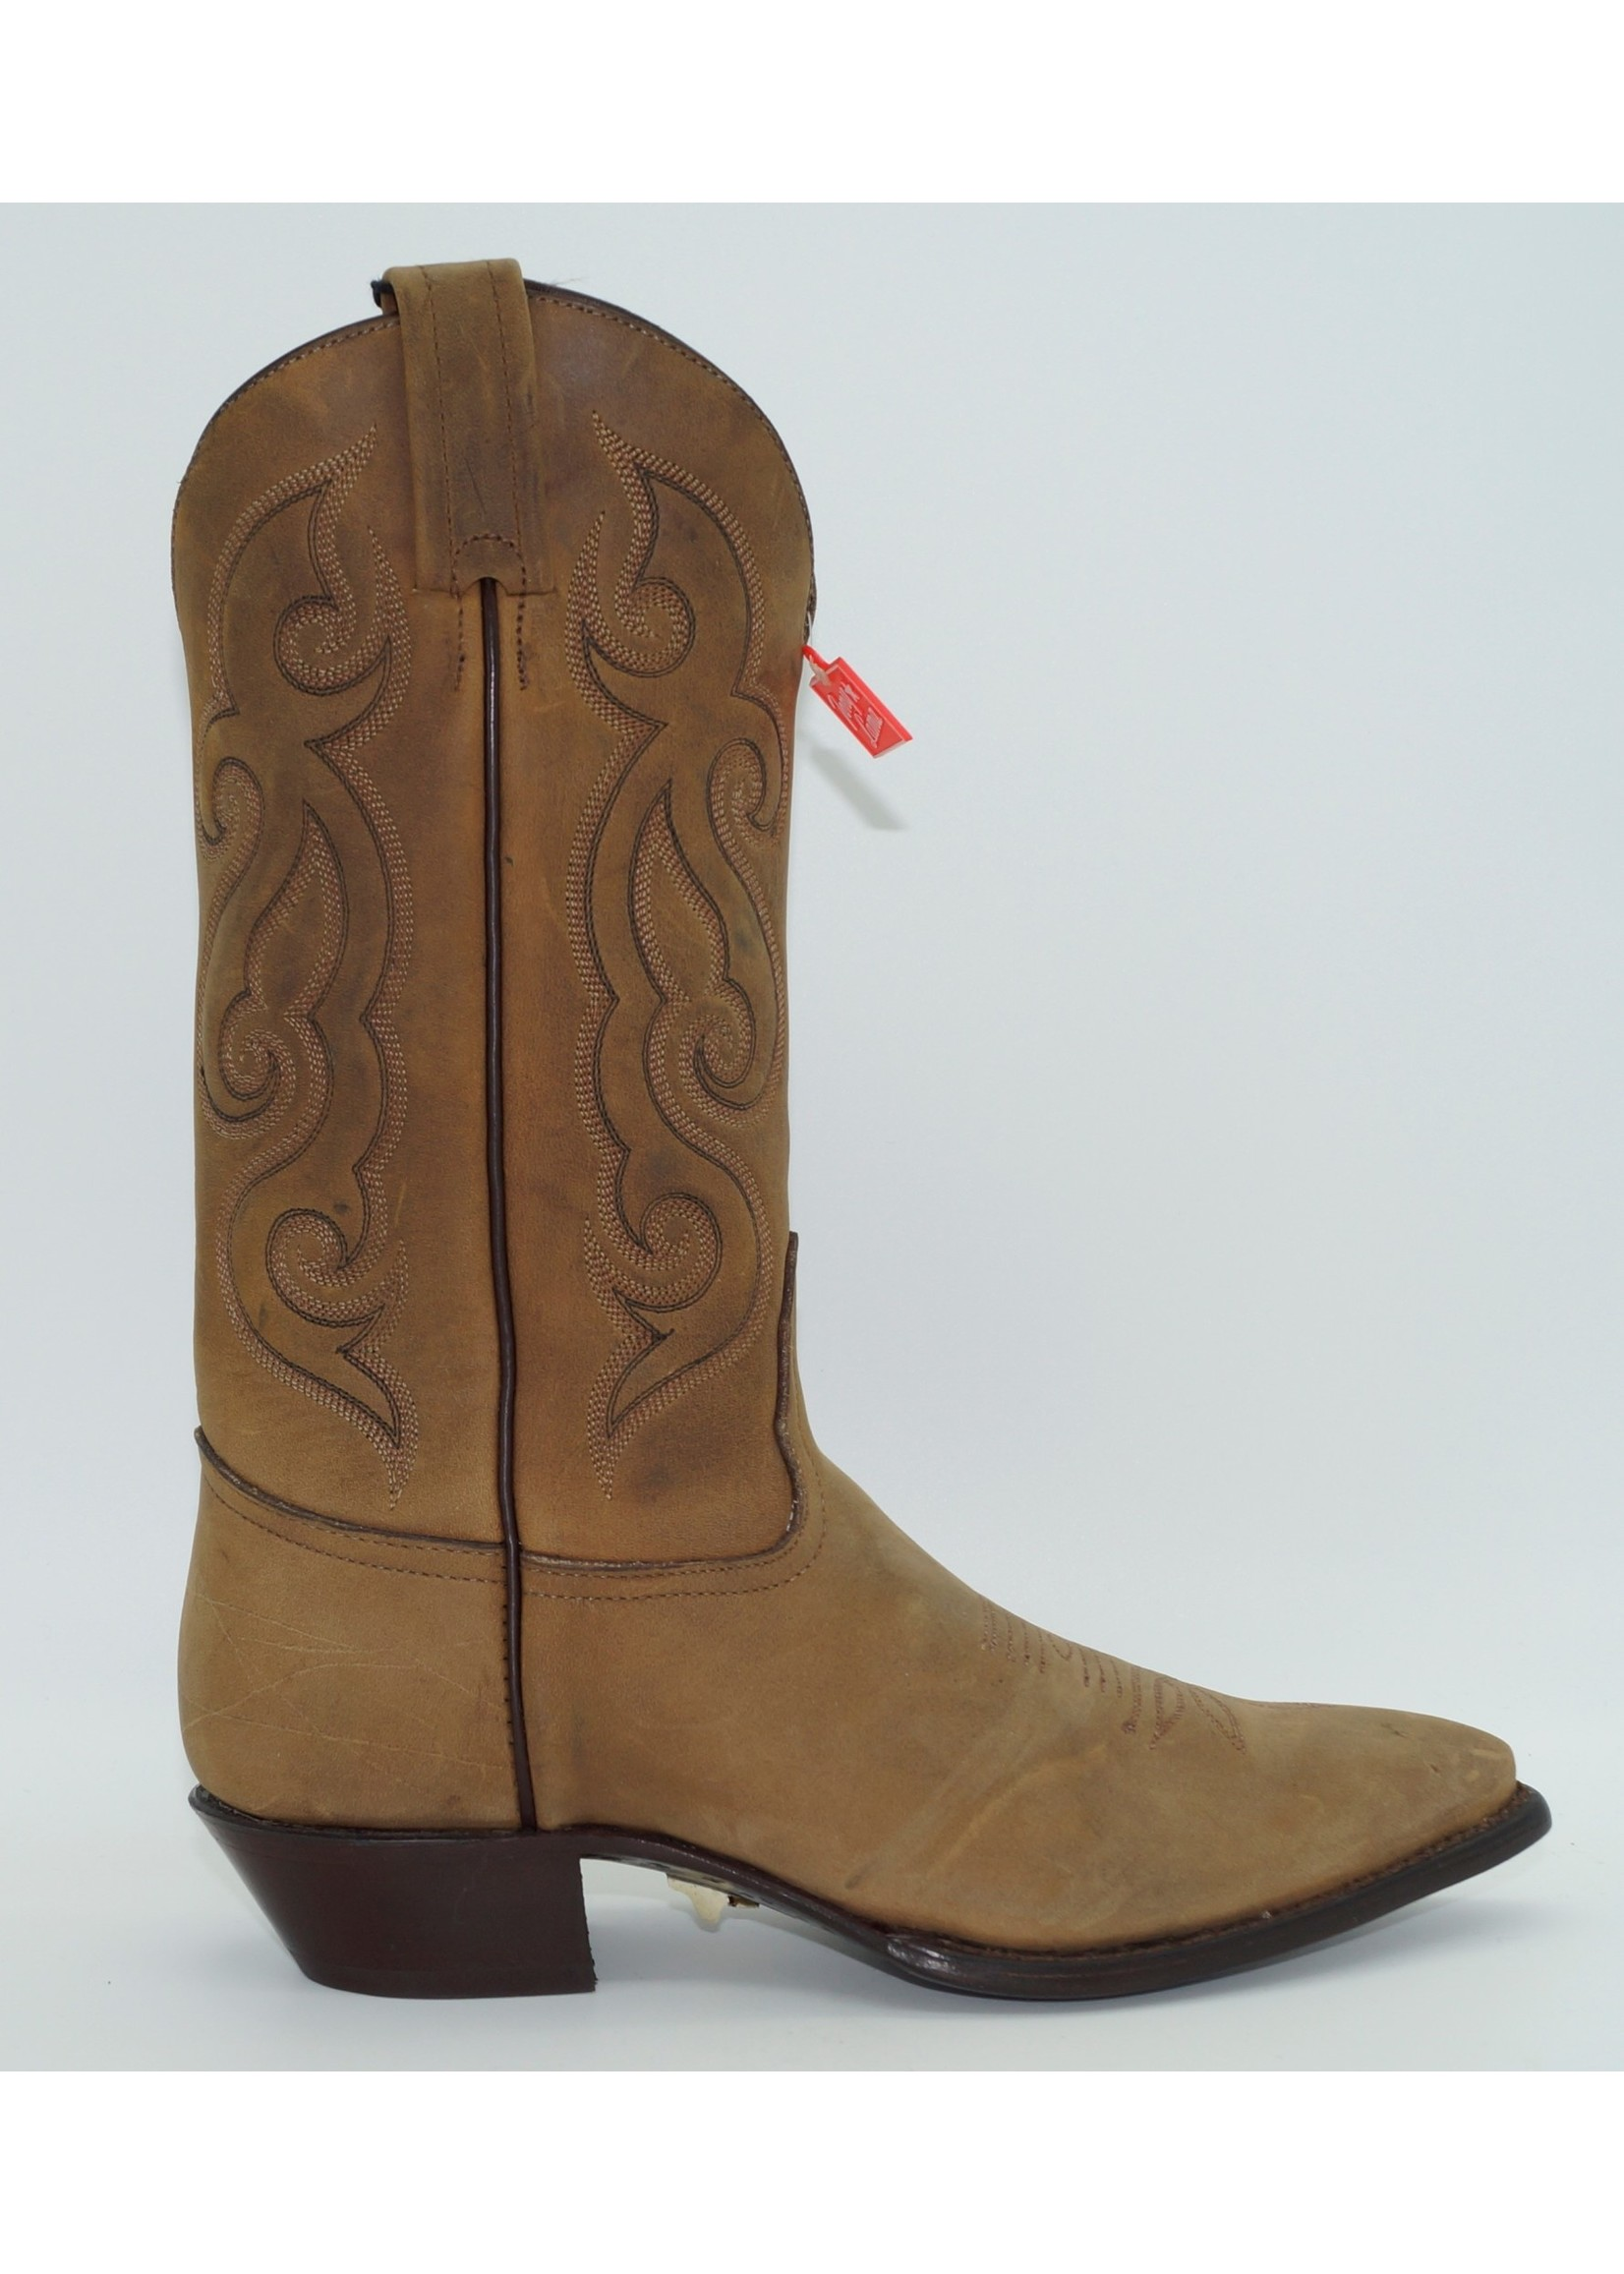 Tony Lama Women's Flat Brown Western Boot 1153L